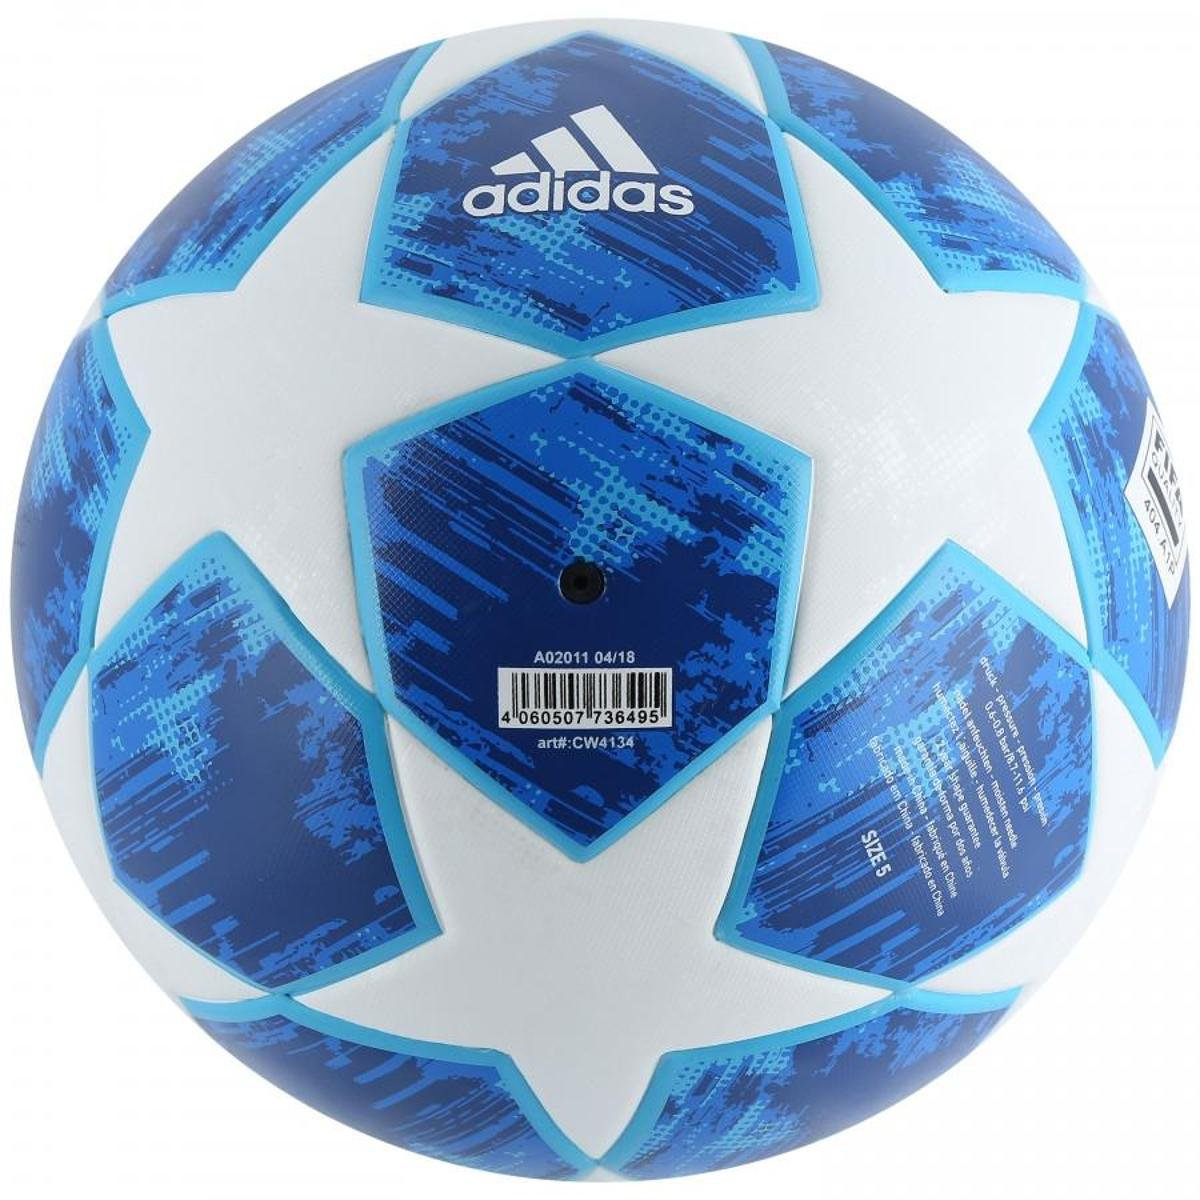 ... Bola de Futebol Campo Uefa Champions League Adidas Finale 18 Top  Training 63111edf6be9d